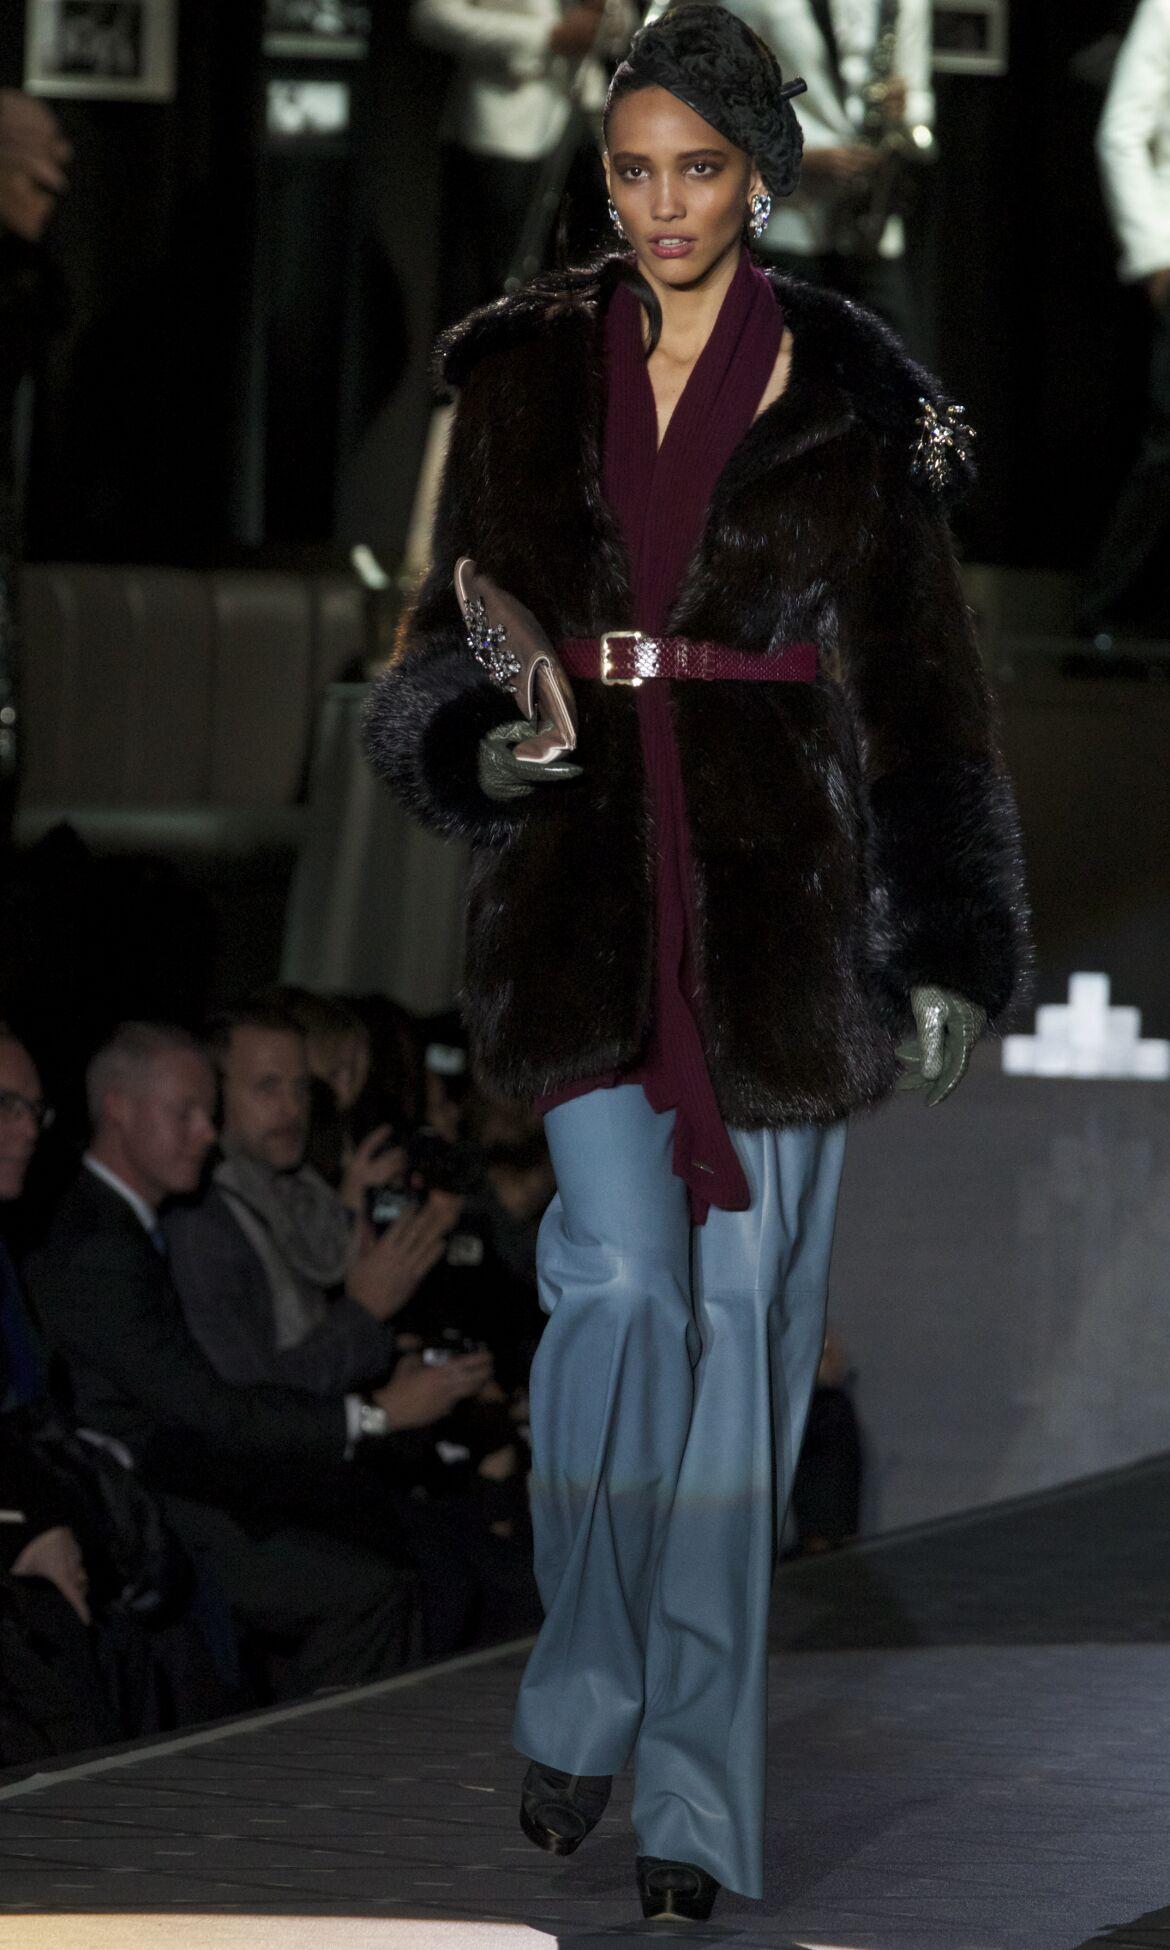 954b1fbb99c Winter 2013 Fashion Show Dsquared2